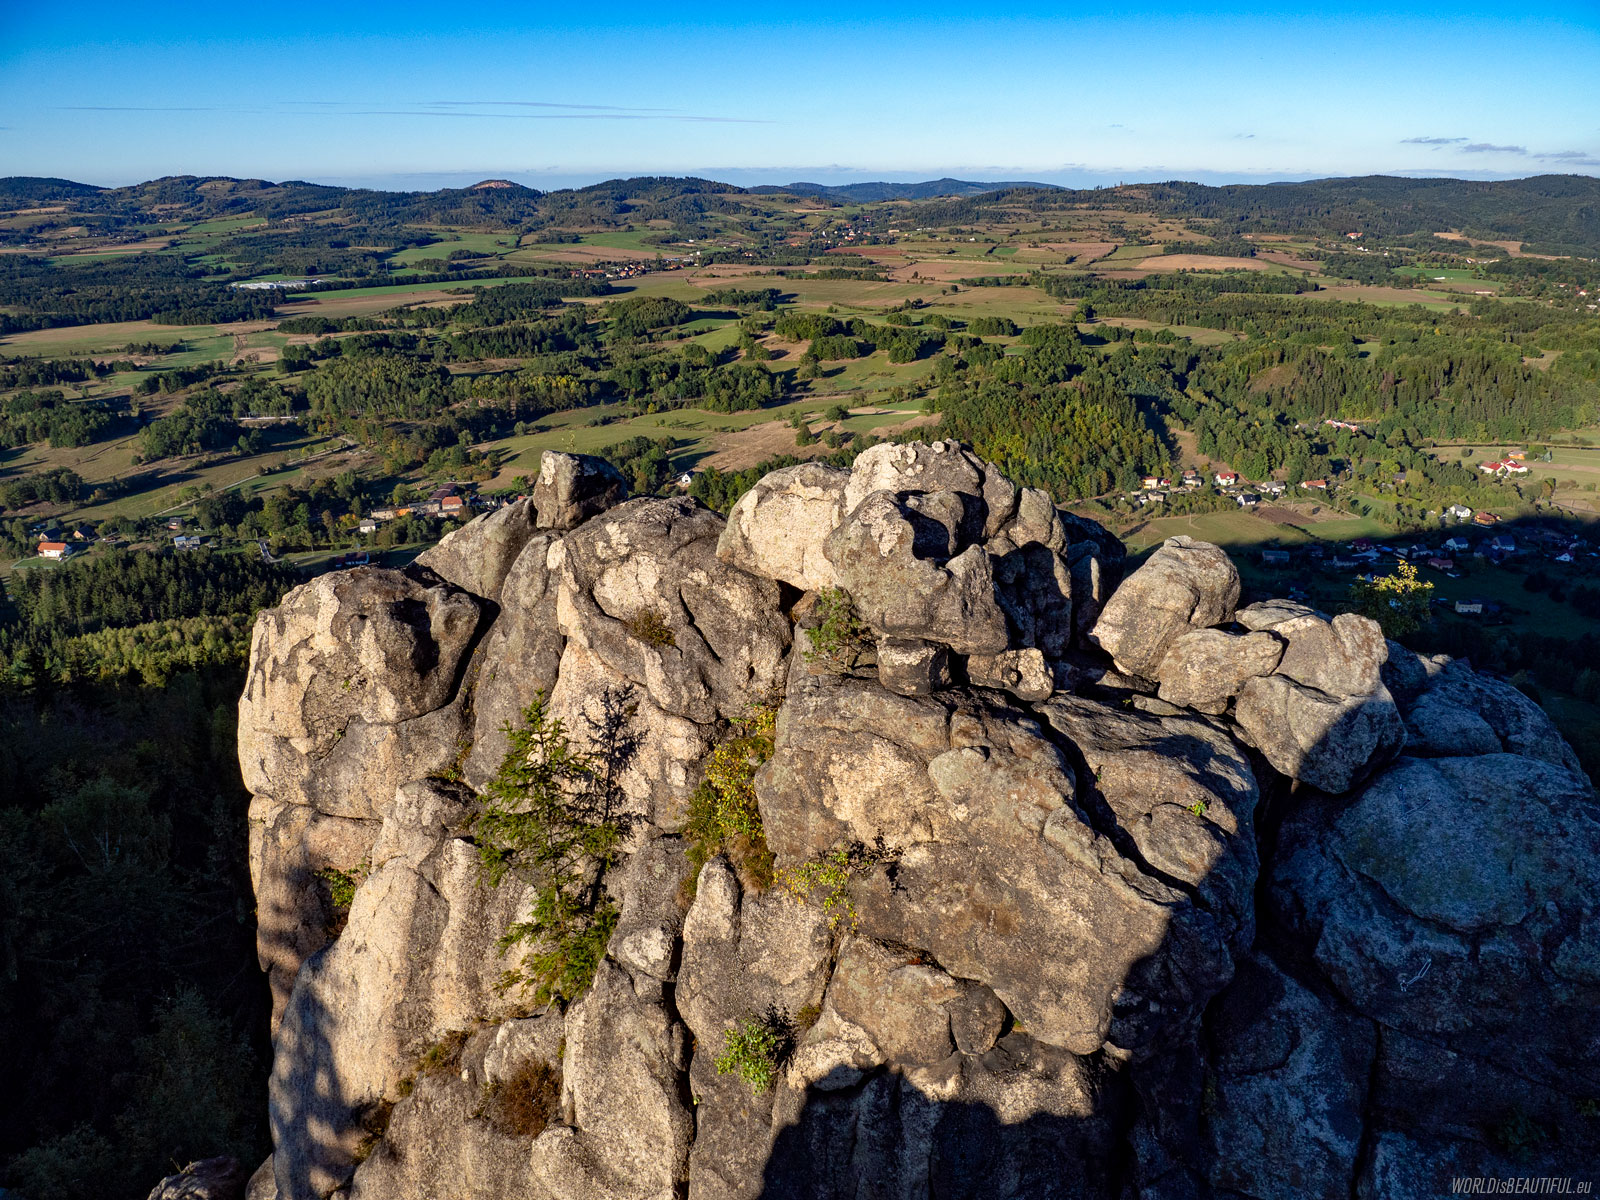 Rocks in Landeshut Ridge